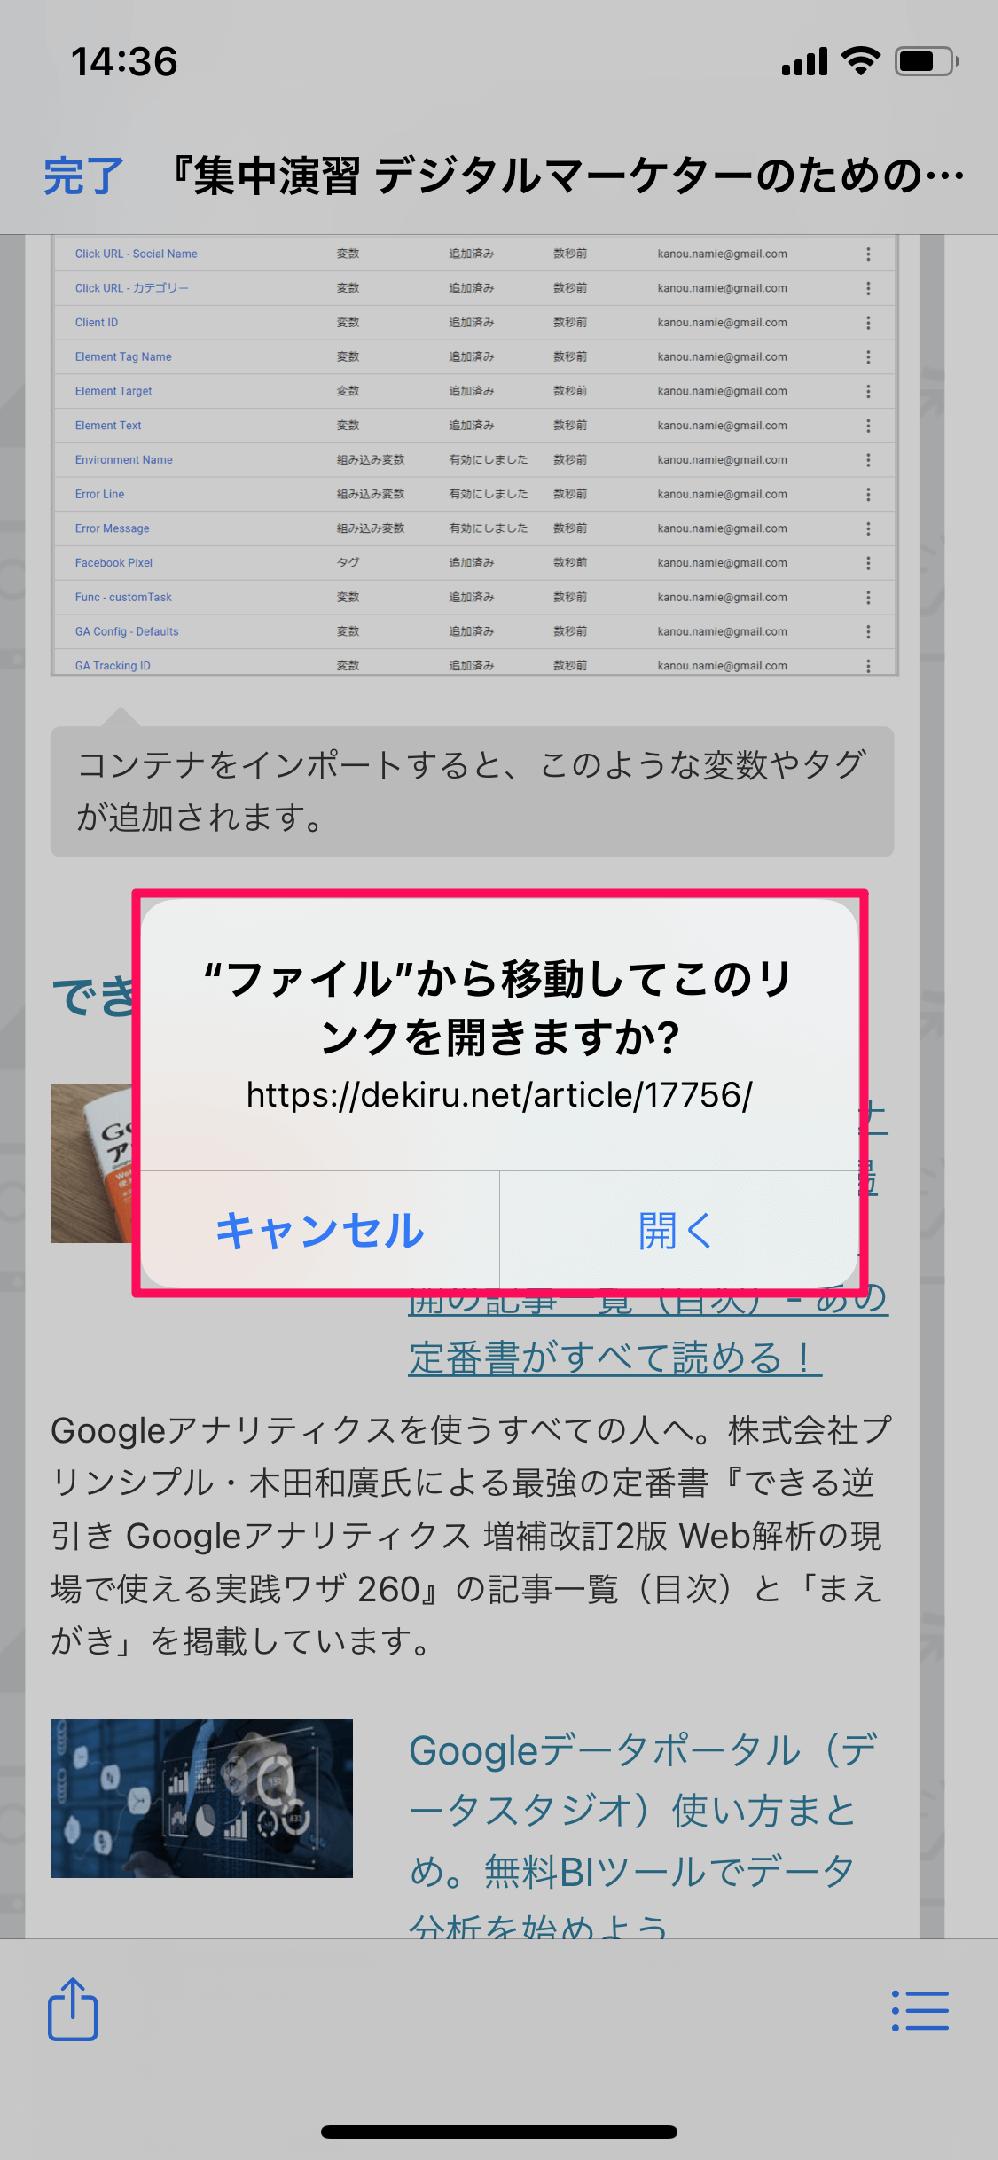 iPhoneでWebページのアーカイブを残す方法。サイトと同じ表示形式で残せる!